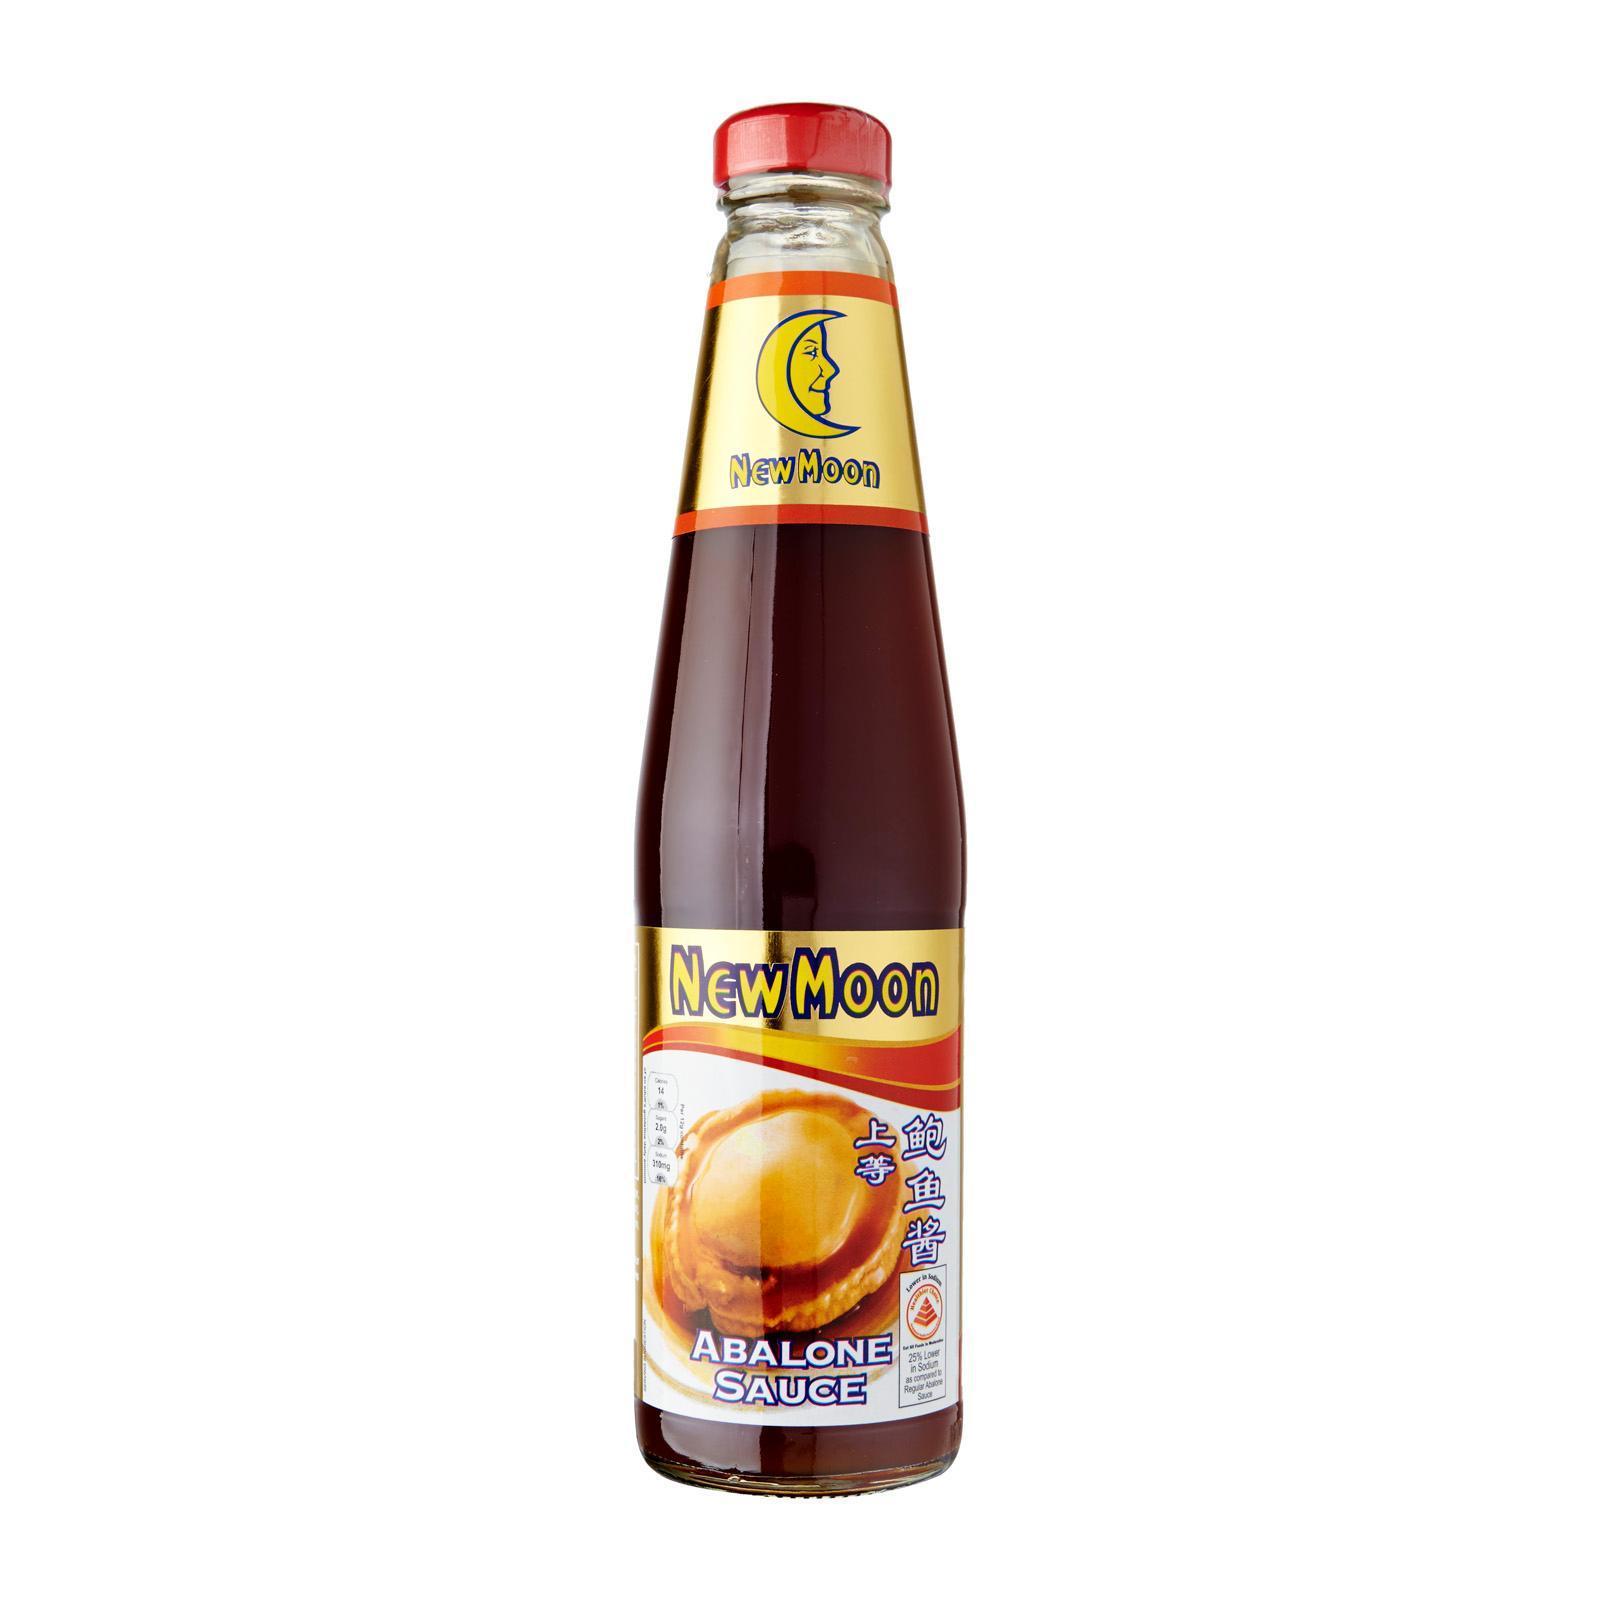 NEW MOON Abalone Sauce 510g